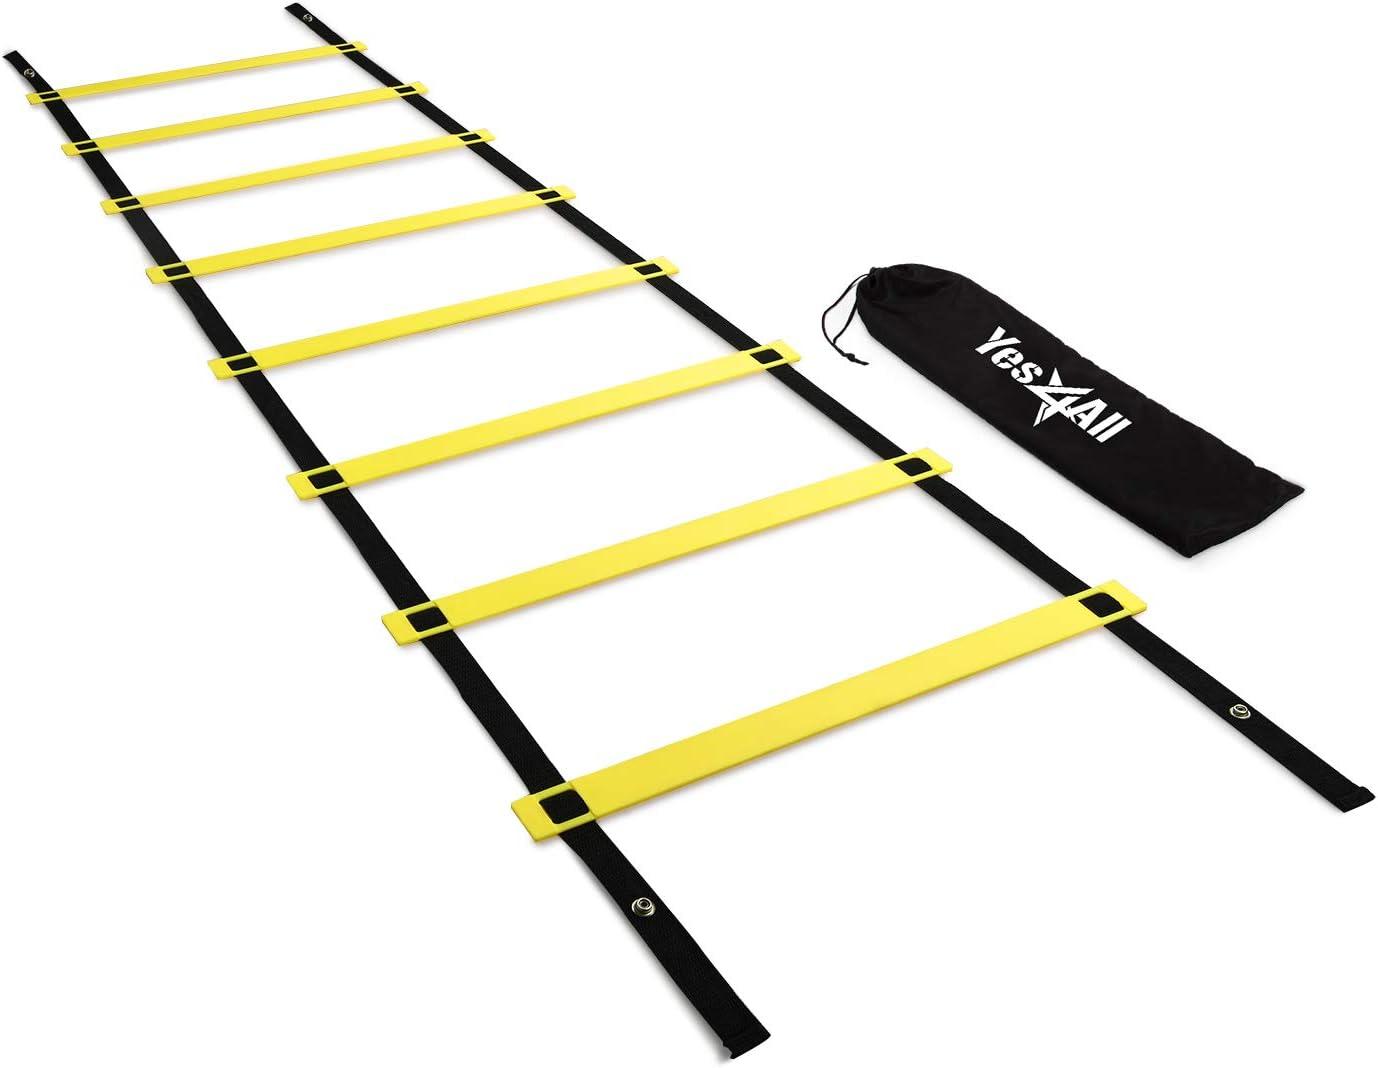 Yellow SKLZ Quick Agility Training Ladder